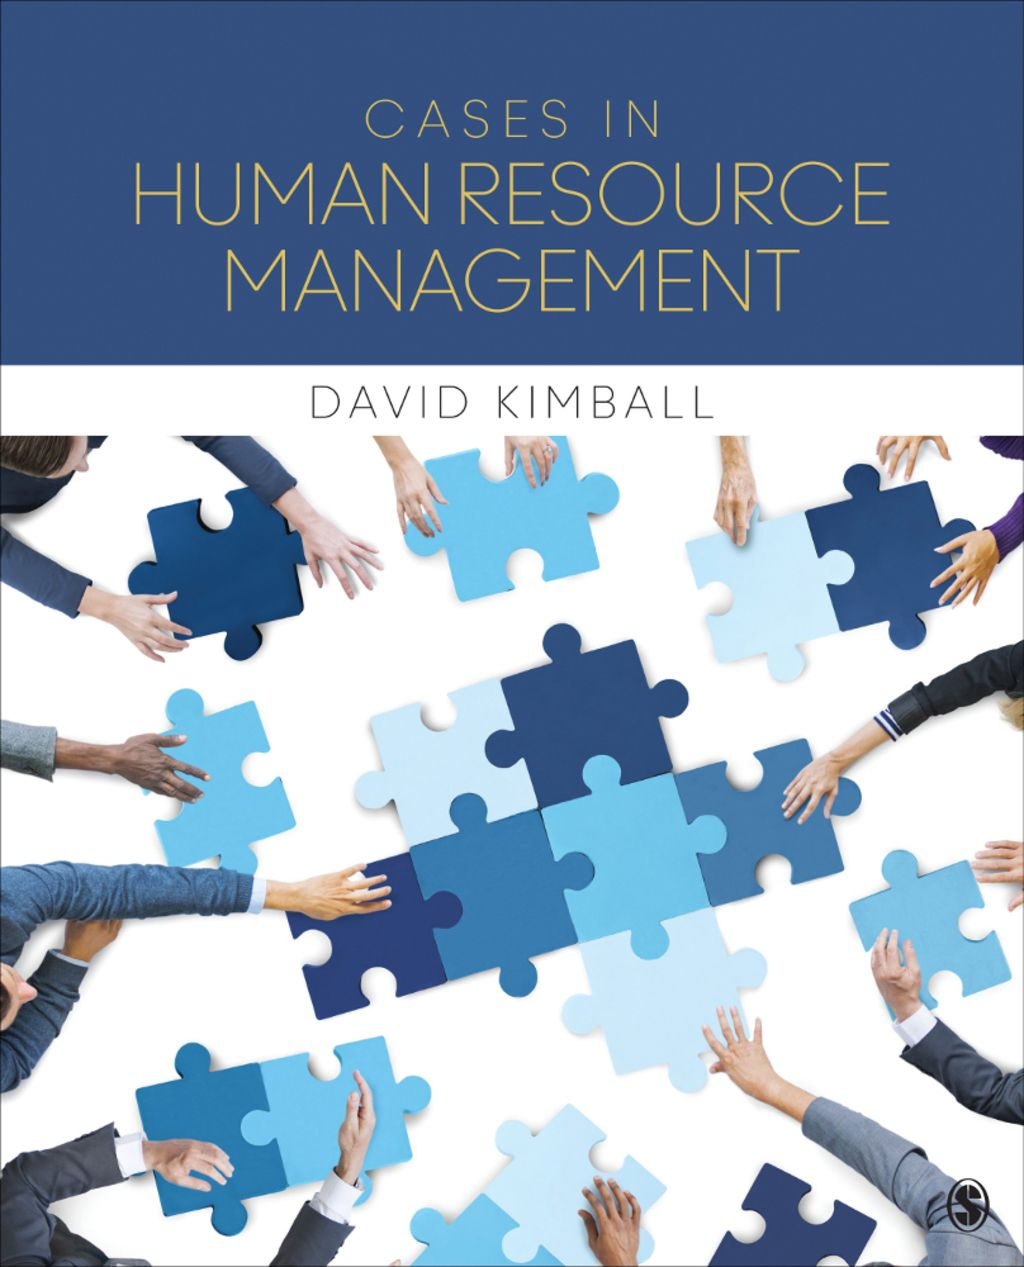 Cases in Human Resource Management (eBook Rental) in 2020